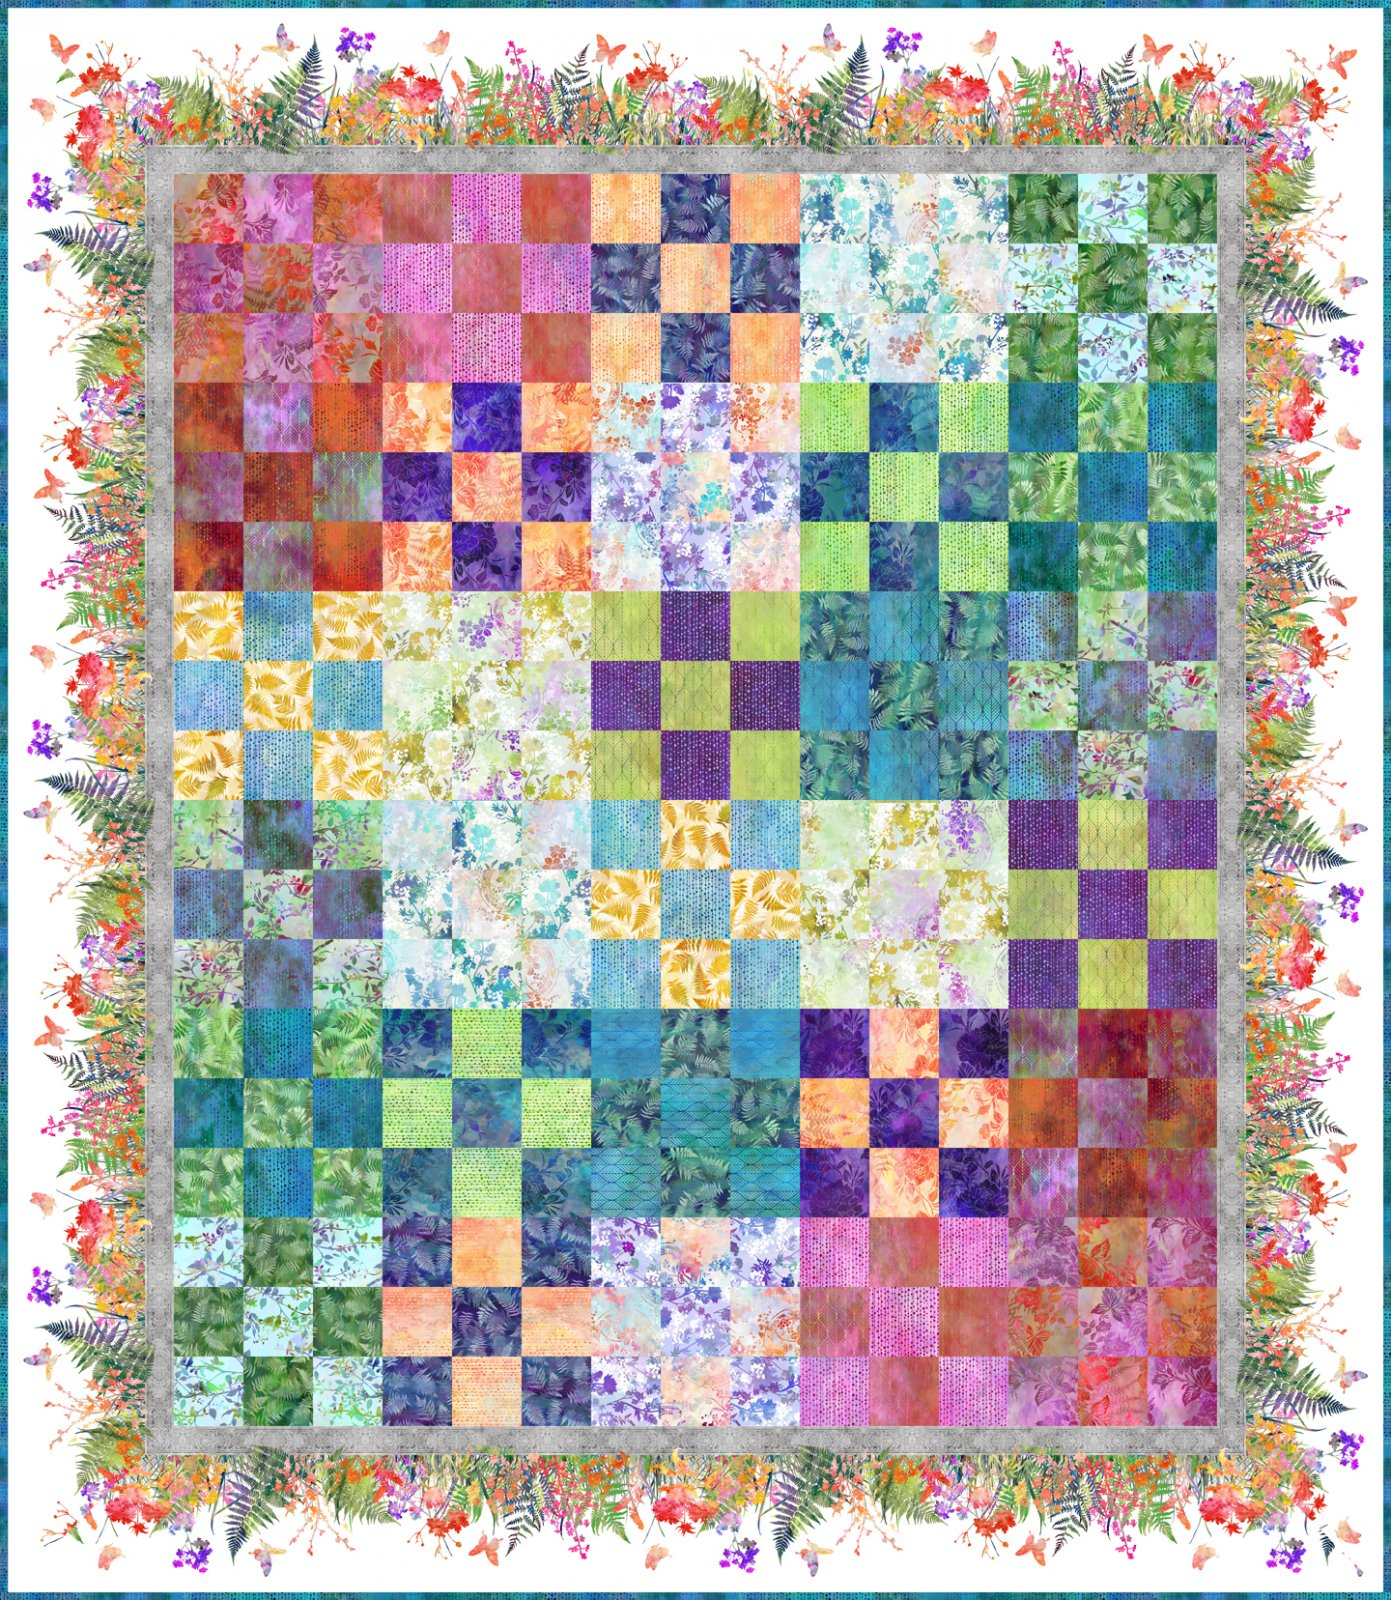 Garden 9-Patch Quilt Kit